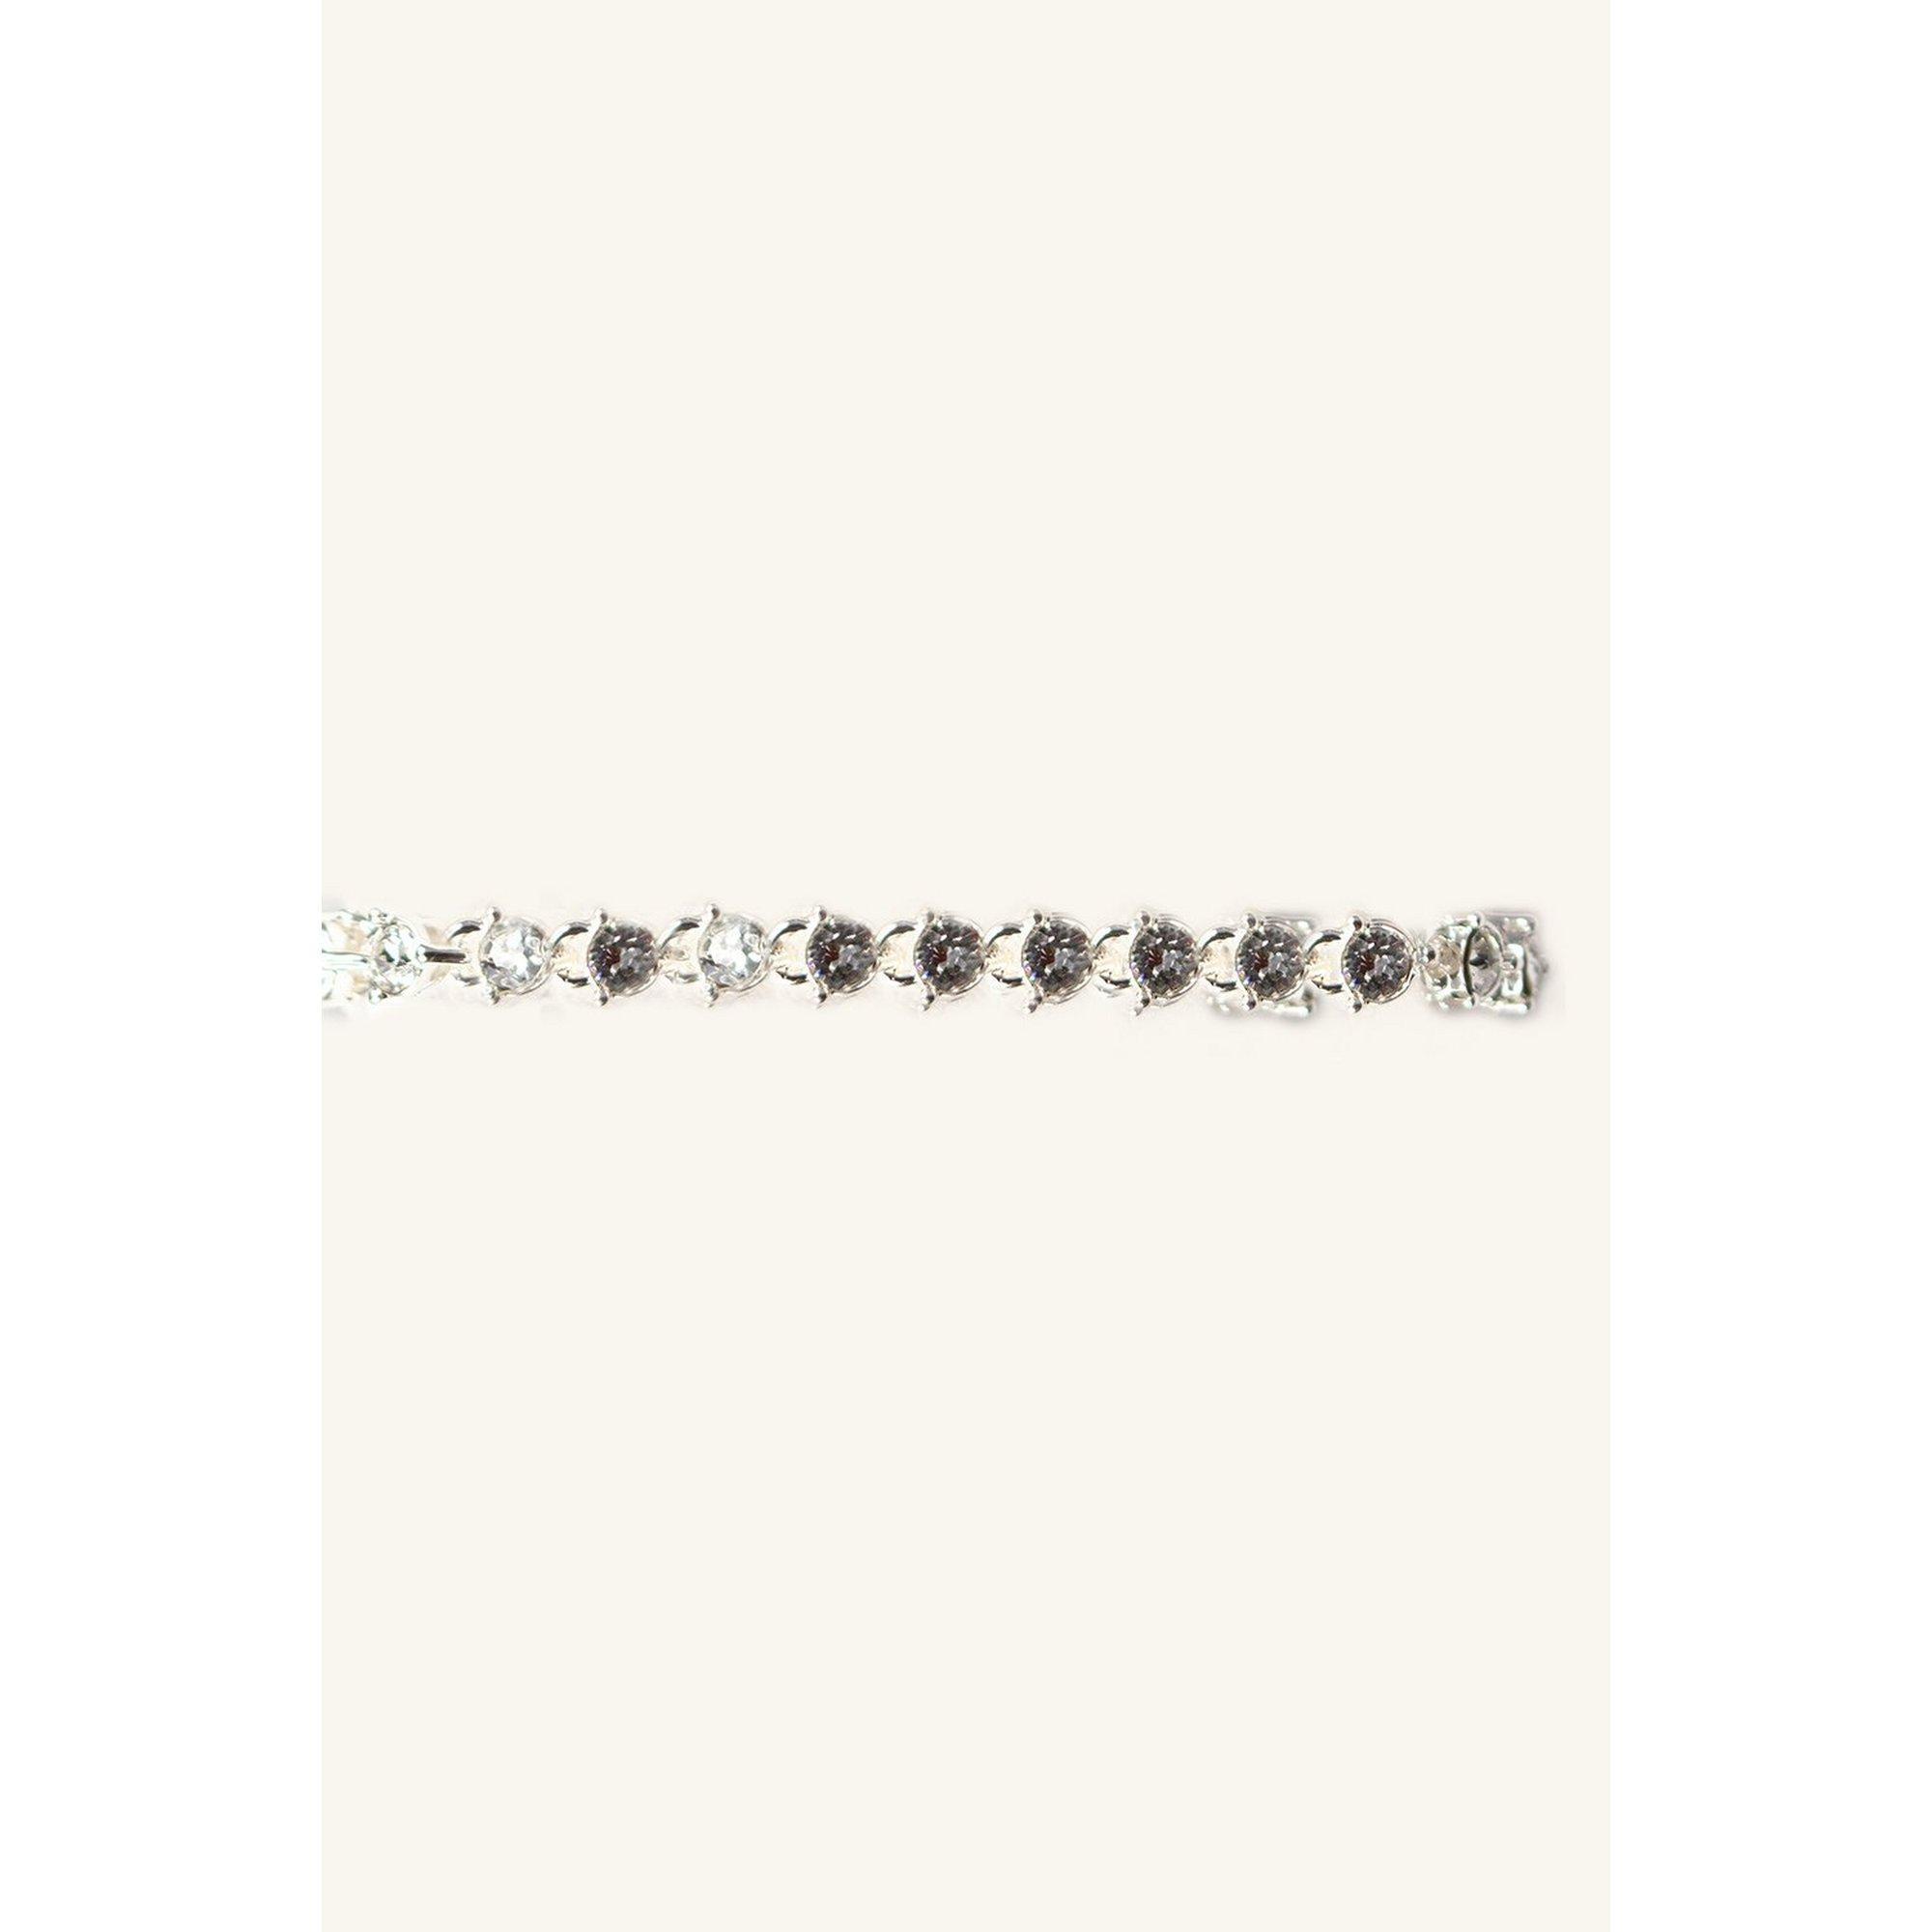 Image of Eternity Silver Bracelet with Swarovski Elements